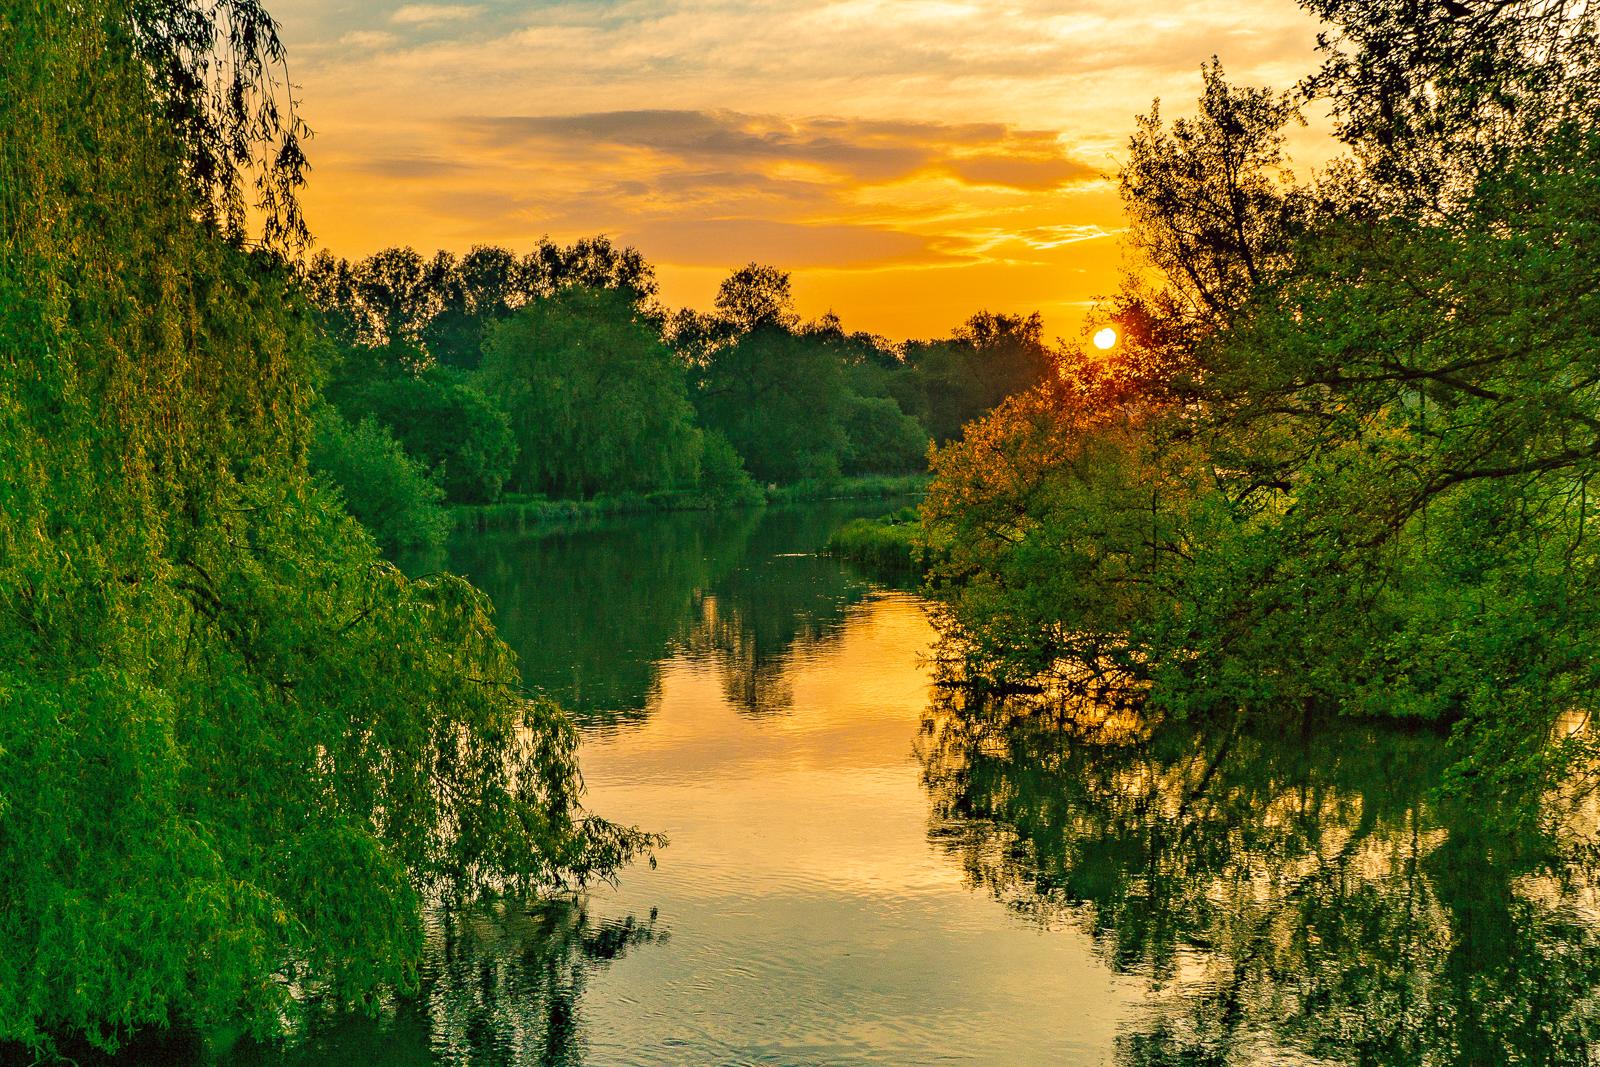 64_Woodford Bridge Sunrise_Terry Waldron